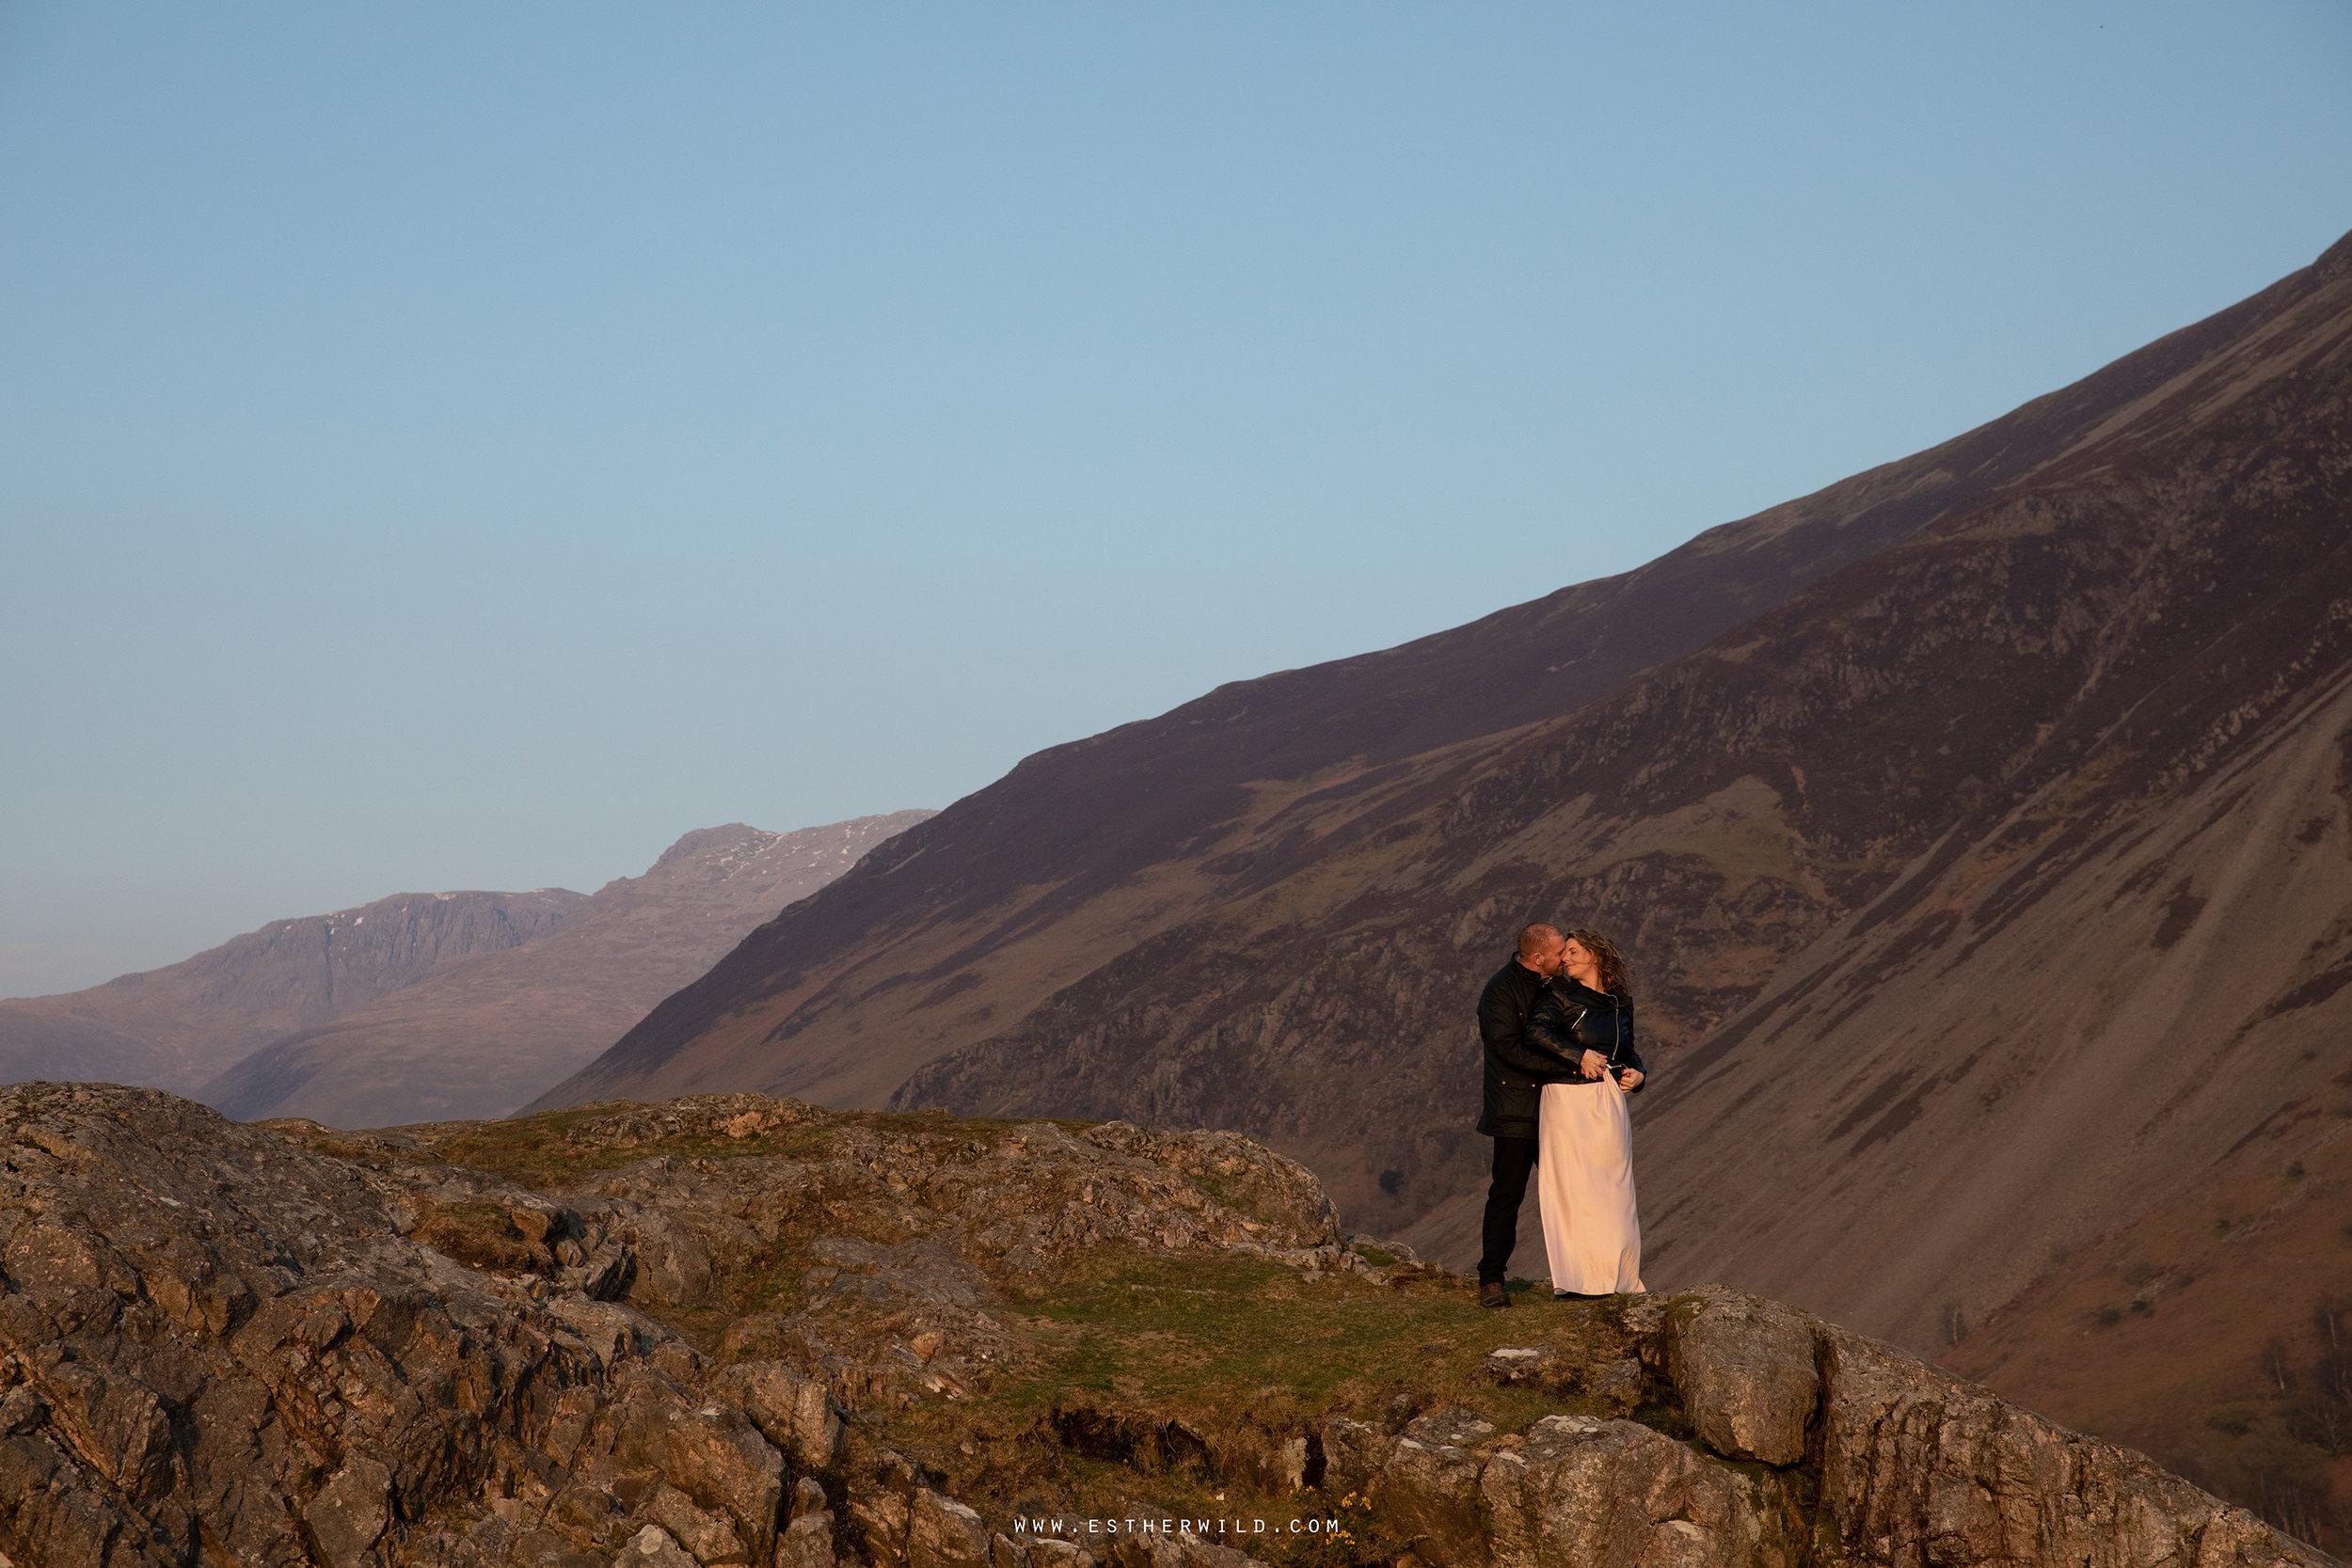 Cumbria_Lake_District_Wasdale_Wedding_Photographer_Destination_Engagement_Anniversary_Esther_Wild_IMG_4633.jpg